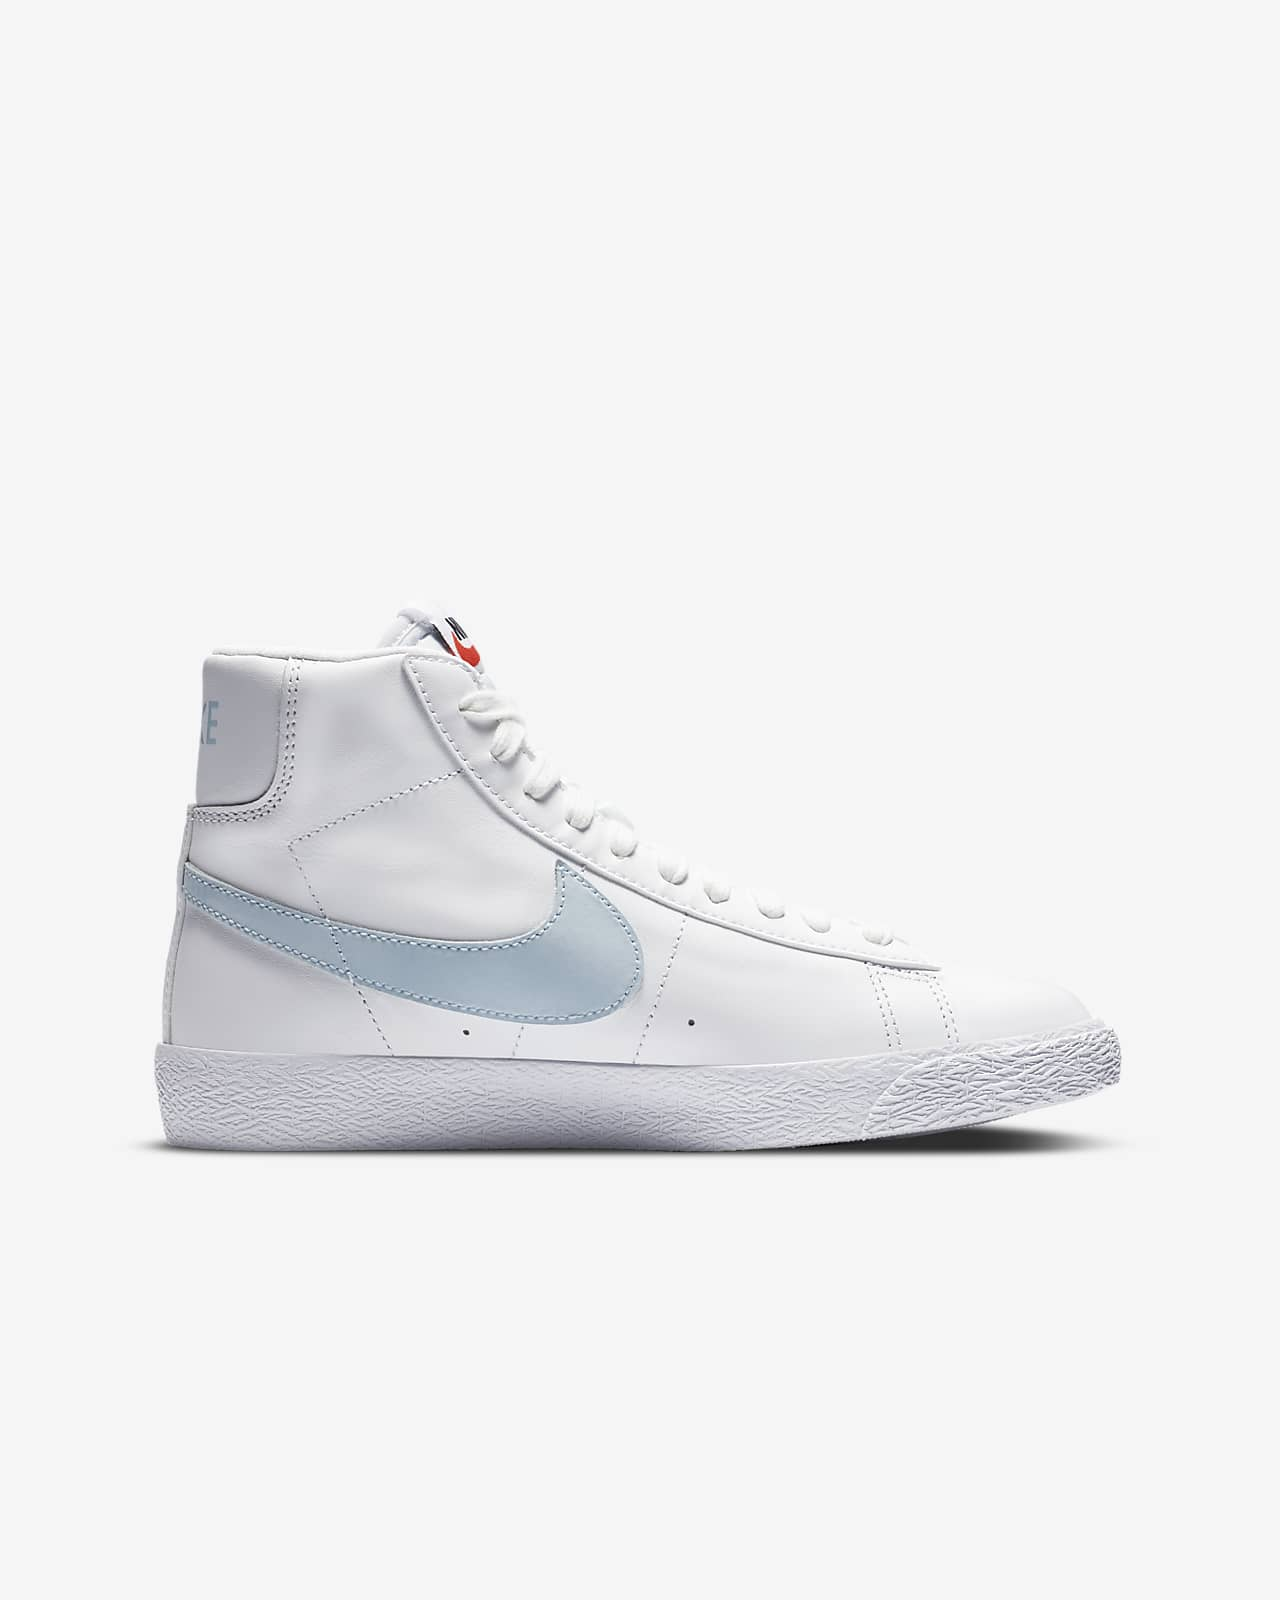 Nike Blazer Mid Older Kids' Shoe. Nike LU